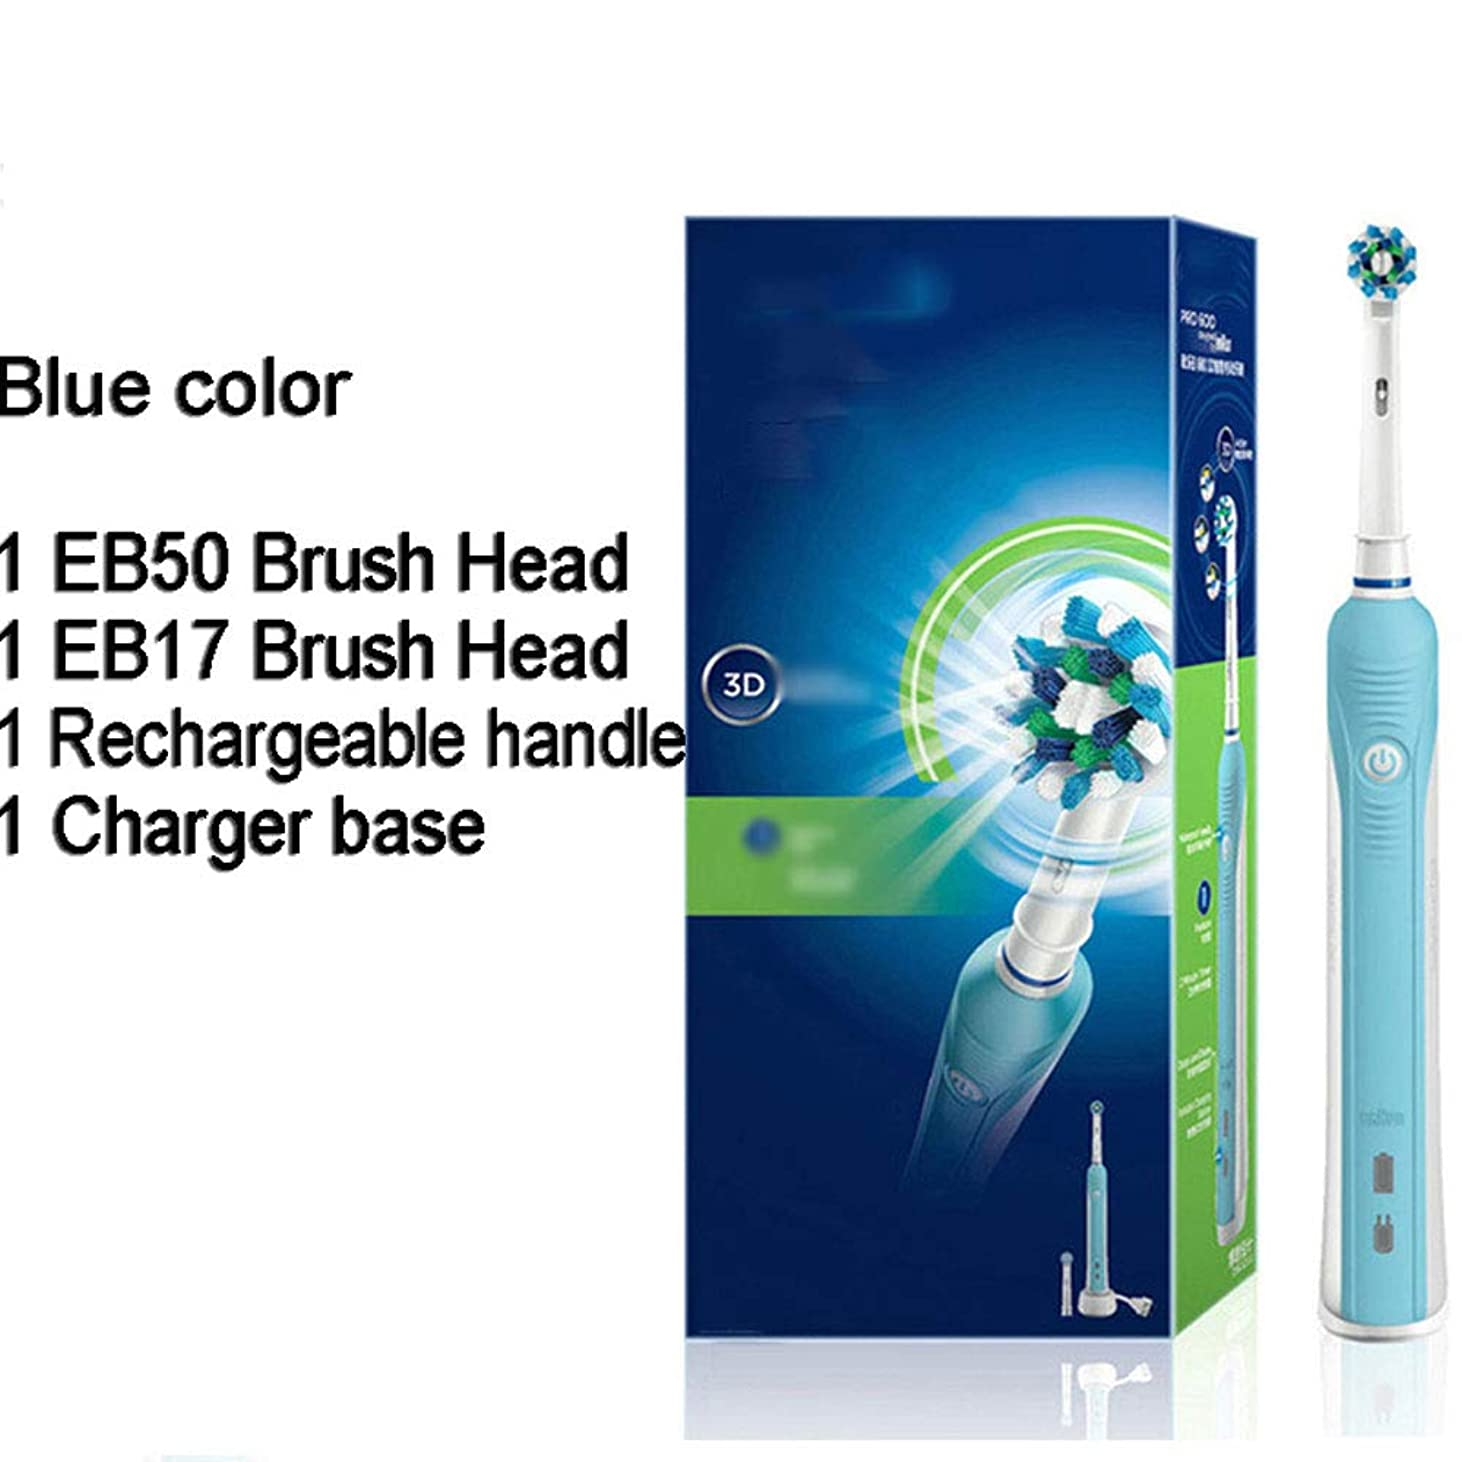 3D電動歯ブラシ口腔衛生電気充電式歯ブラシヘッドディープクリーン3Dホワイト歯ブラシヘッド,ブルー